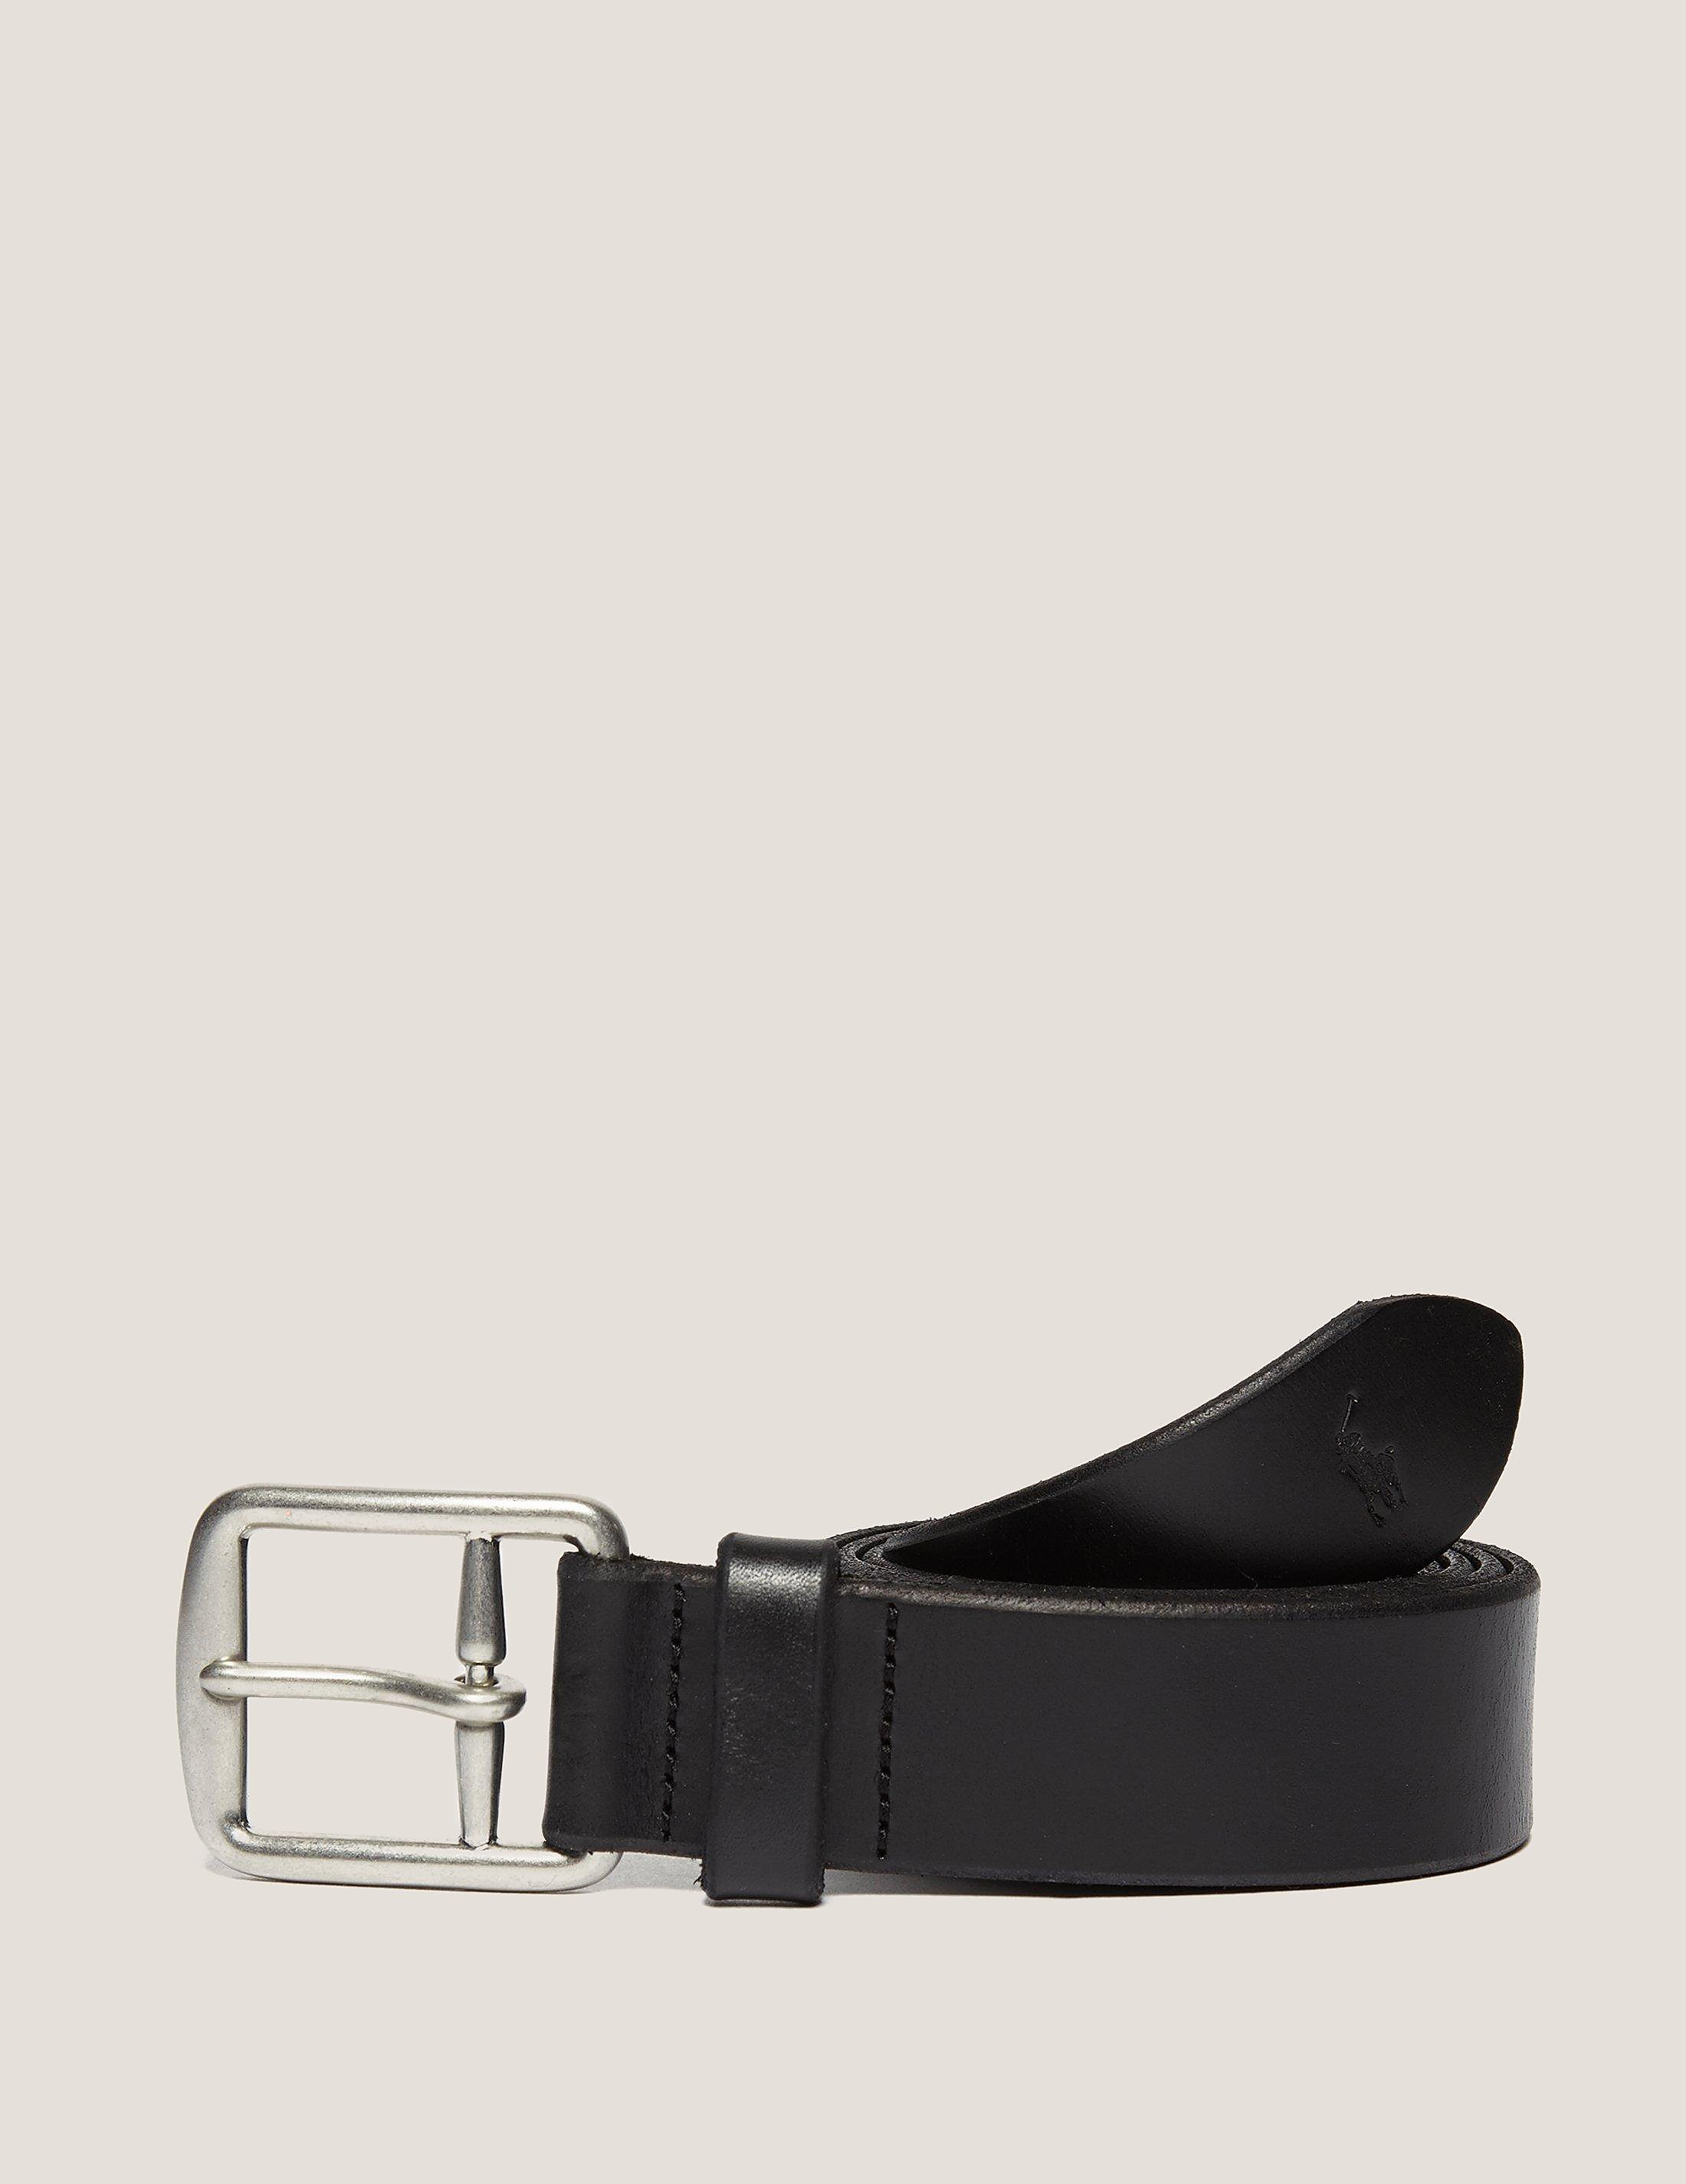 Polo Ralph Lauren Casual Leather Belt